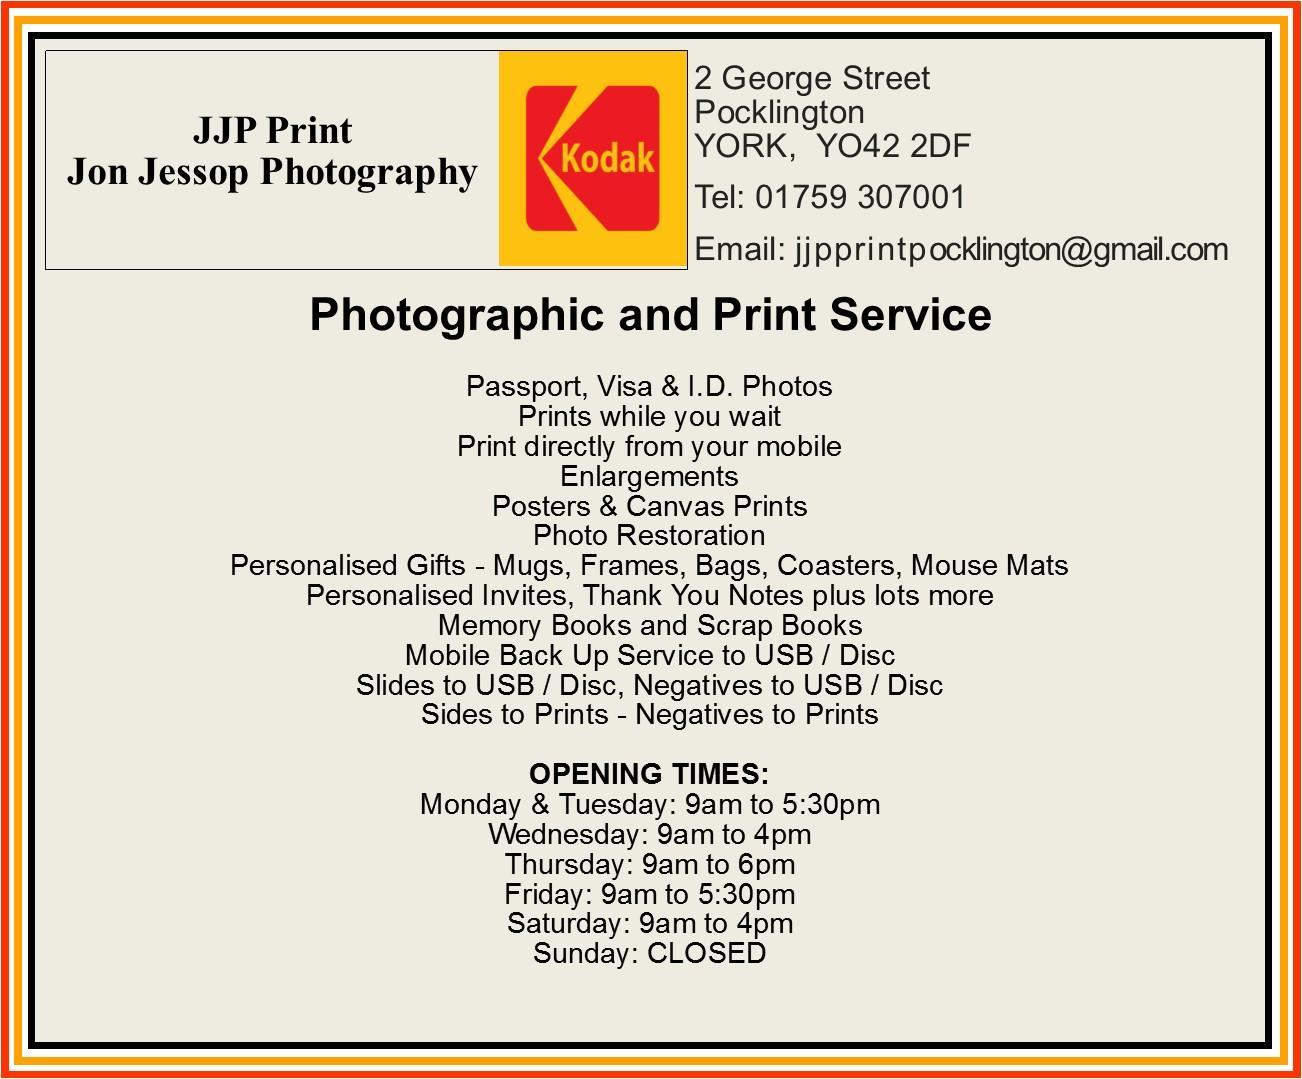 Jon Jessop Print&Photography